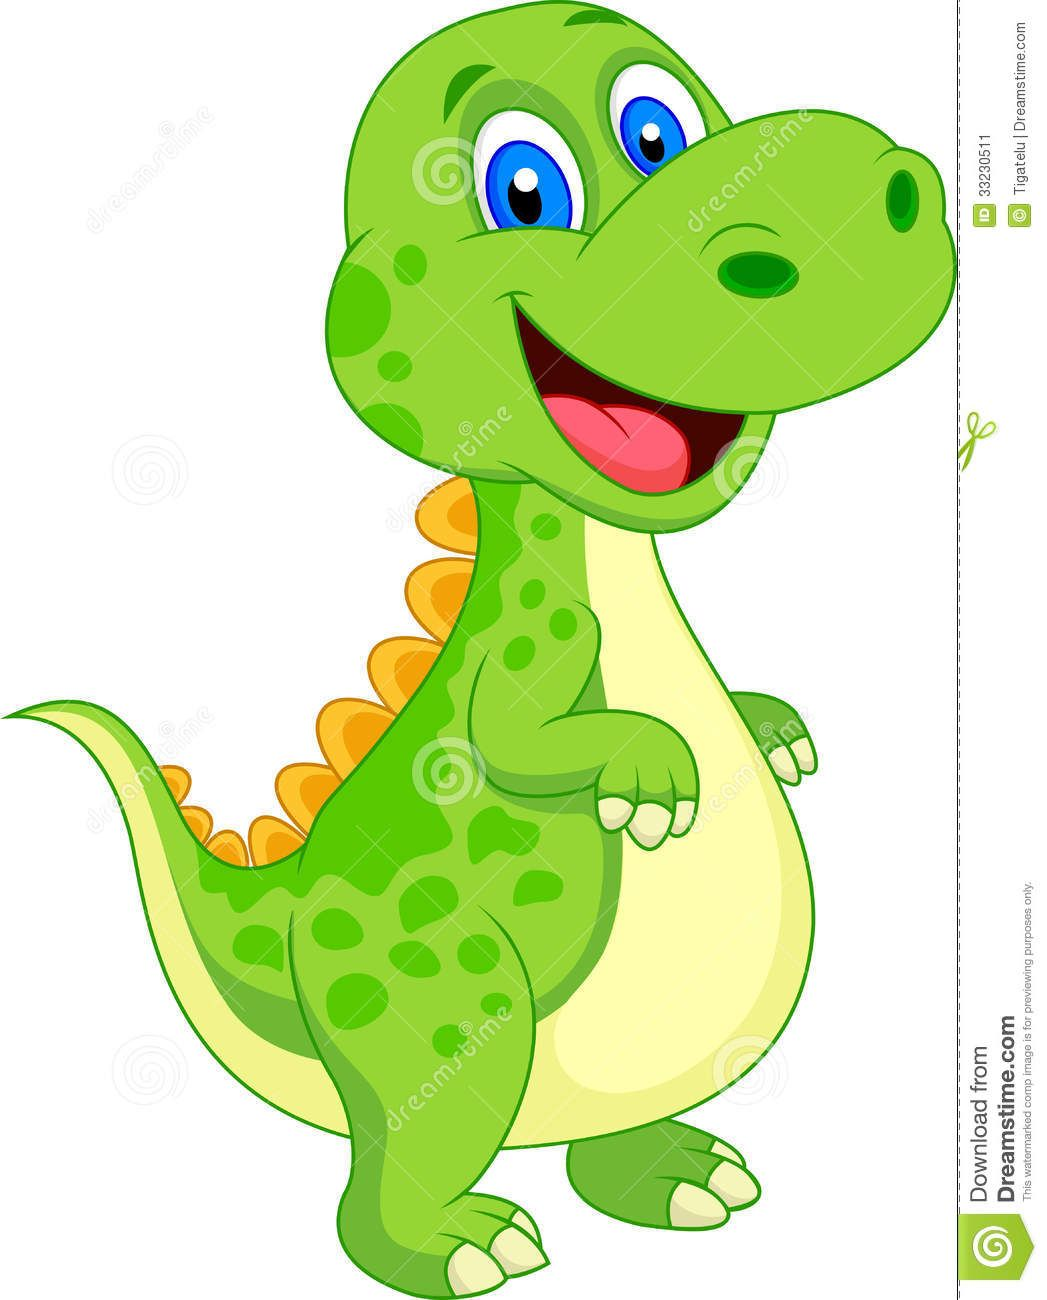 hight resolution of cute dinosaur cartoon stock image image 33230511